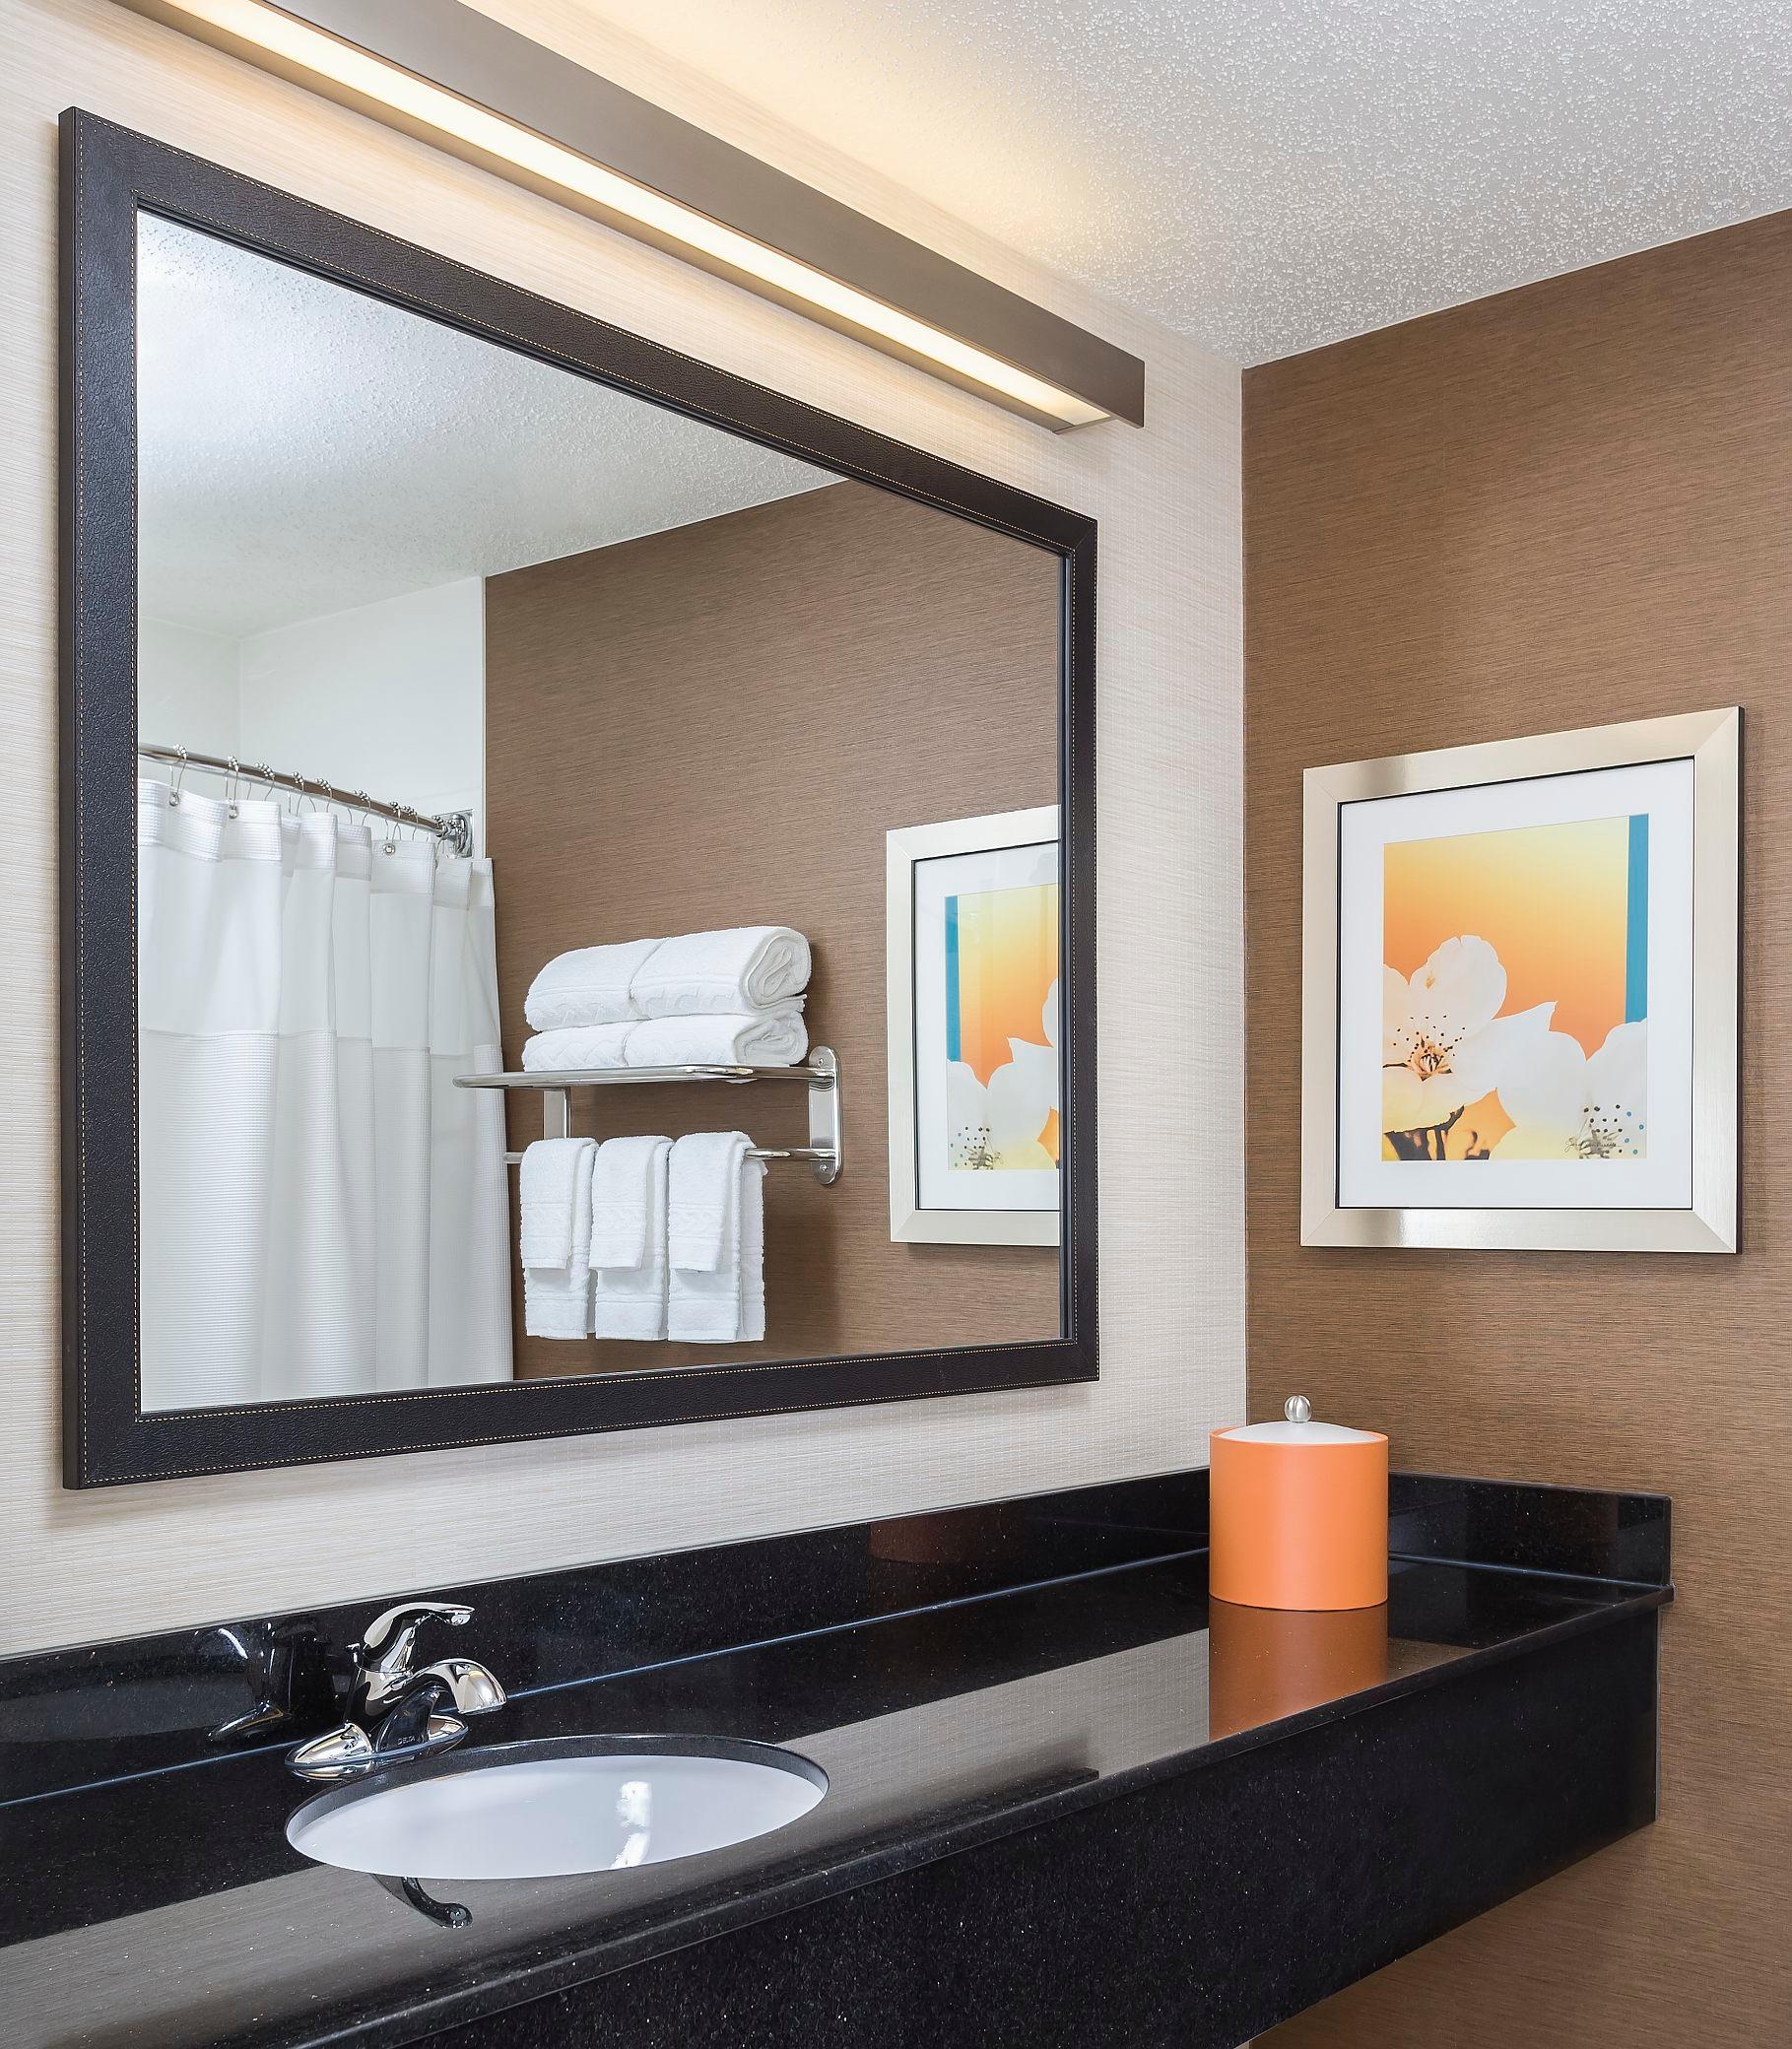 Fairfield Inn & Suites by Marriott Jackson image 13